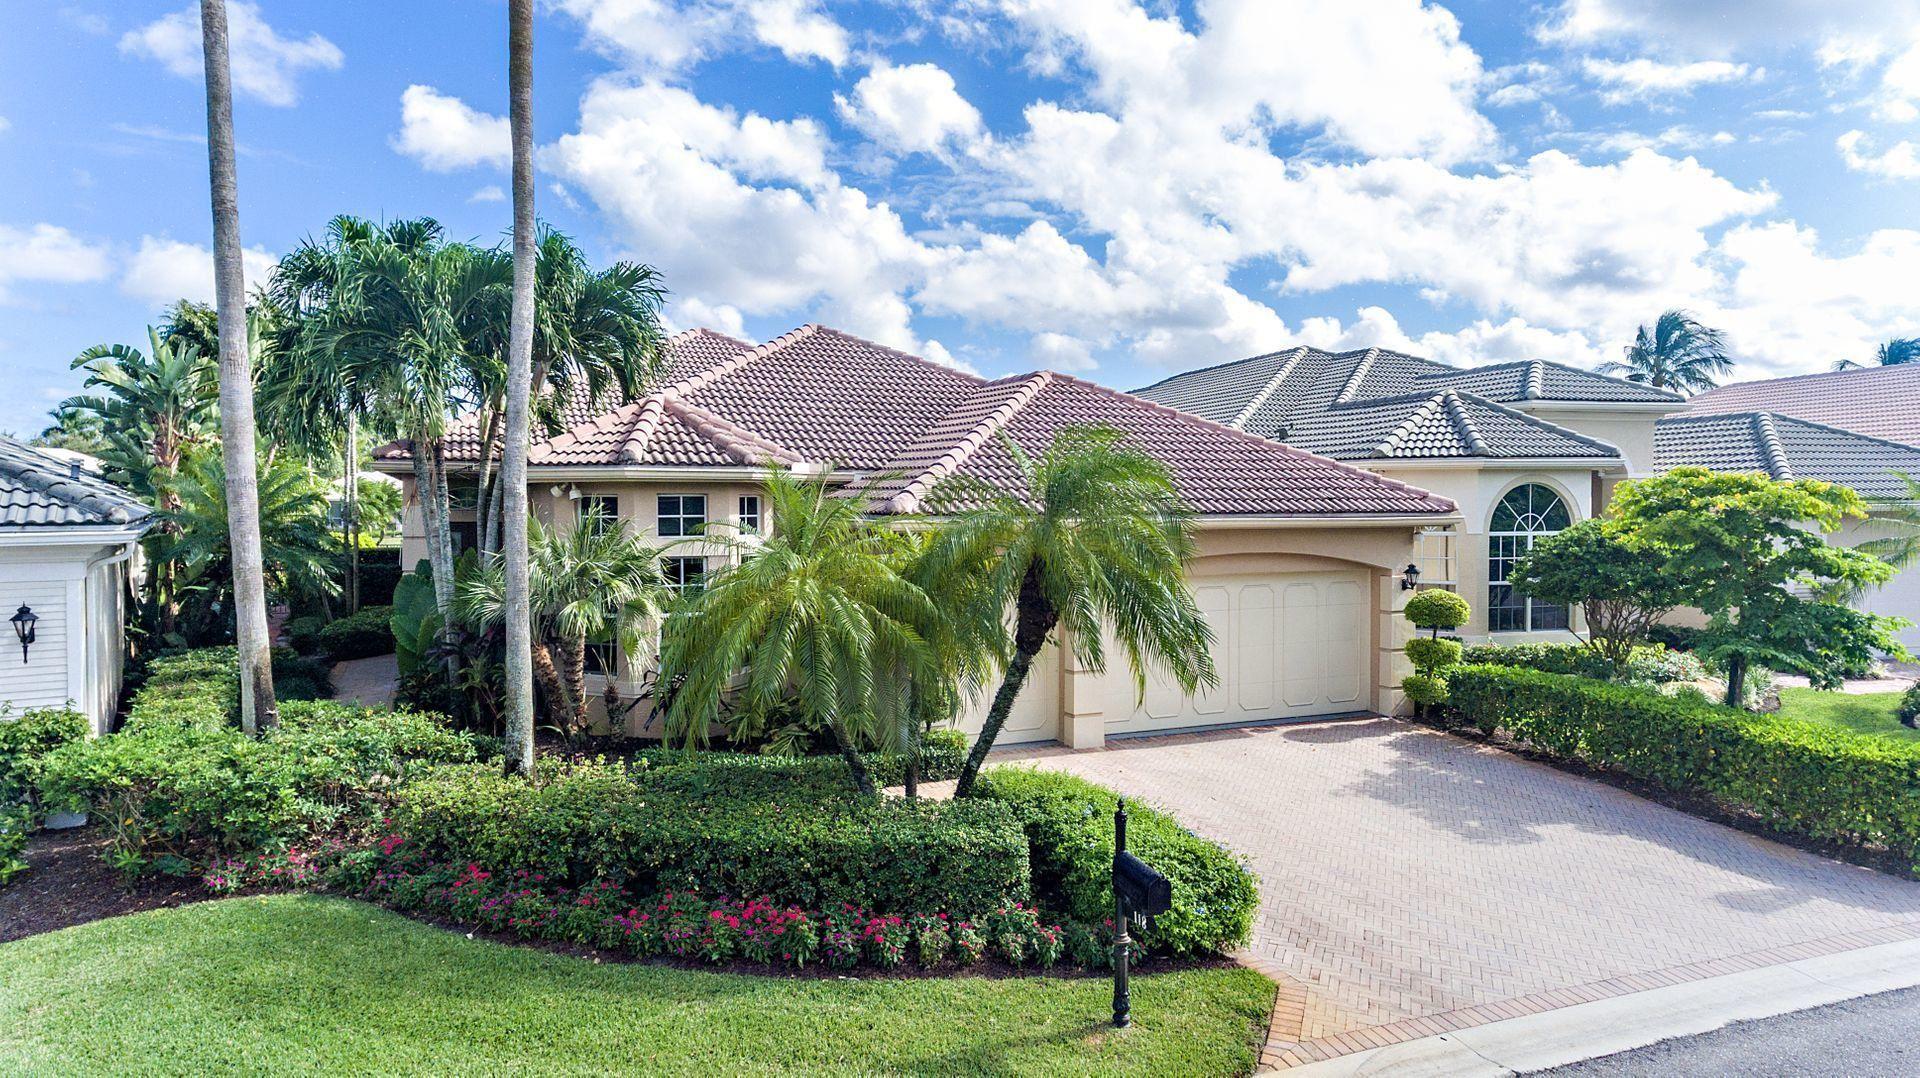 Photo of 118 Banyan Isle Drive, Palm Beach Gardens, FL 33418 (MLS # RX-10697832)